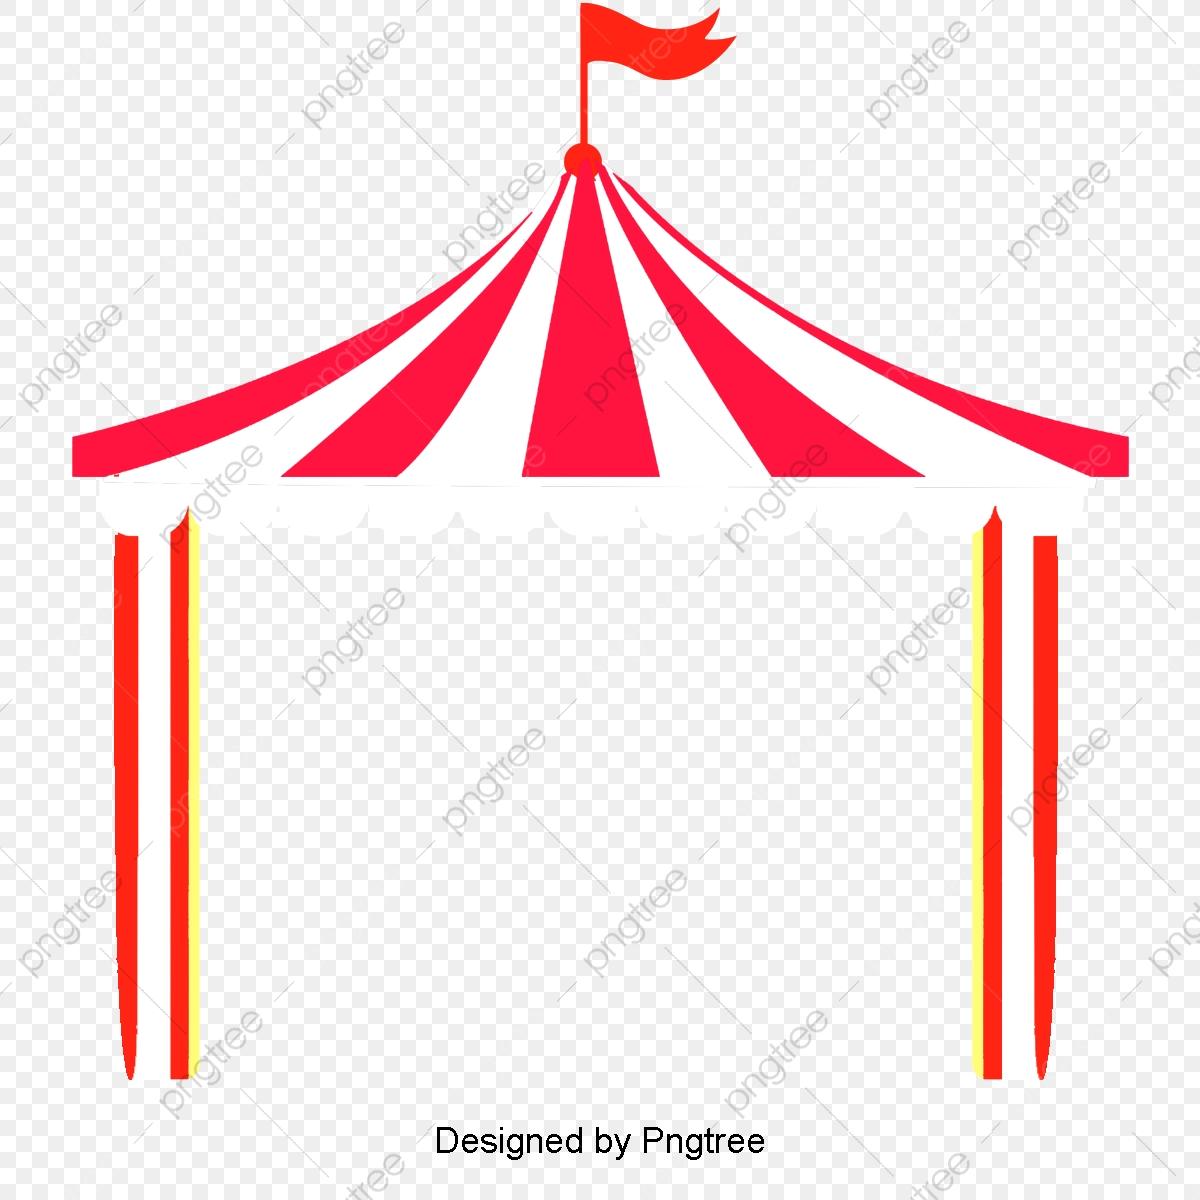 Circus Tent, Circus, Tent, Juggling PNG Transparent Clipart Image.